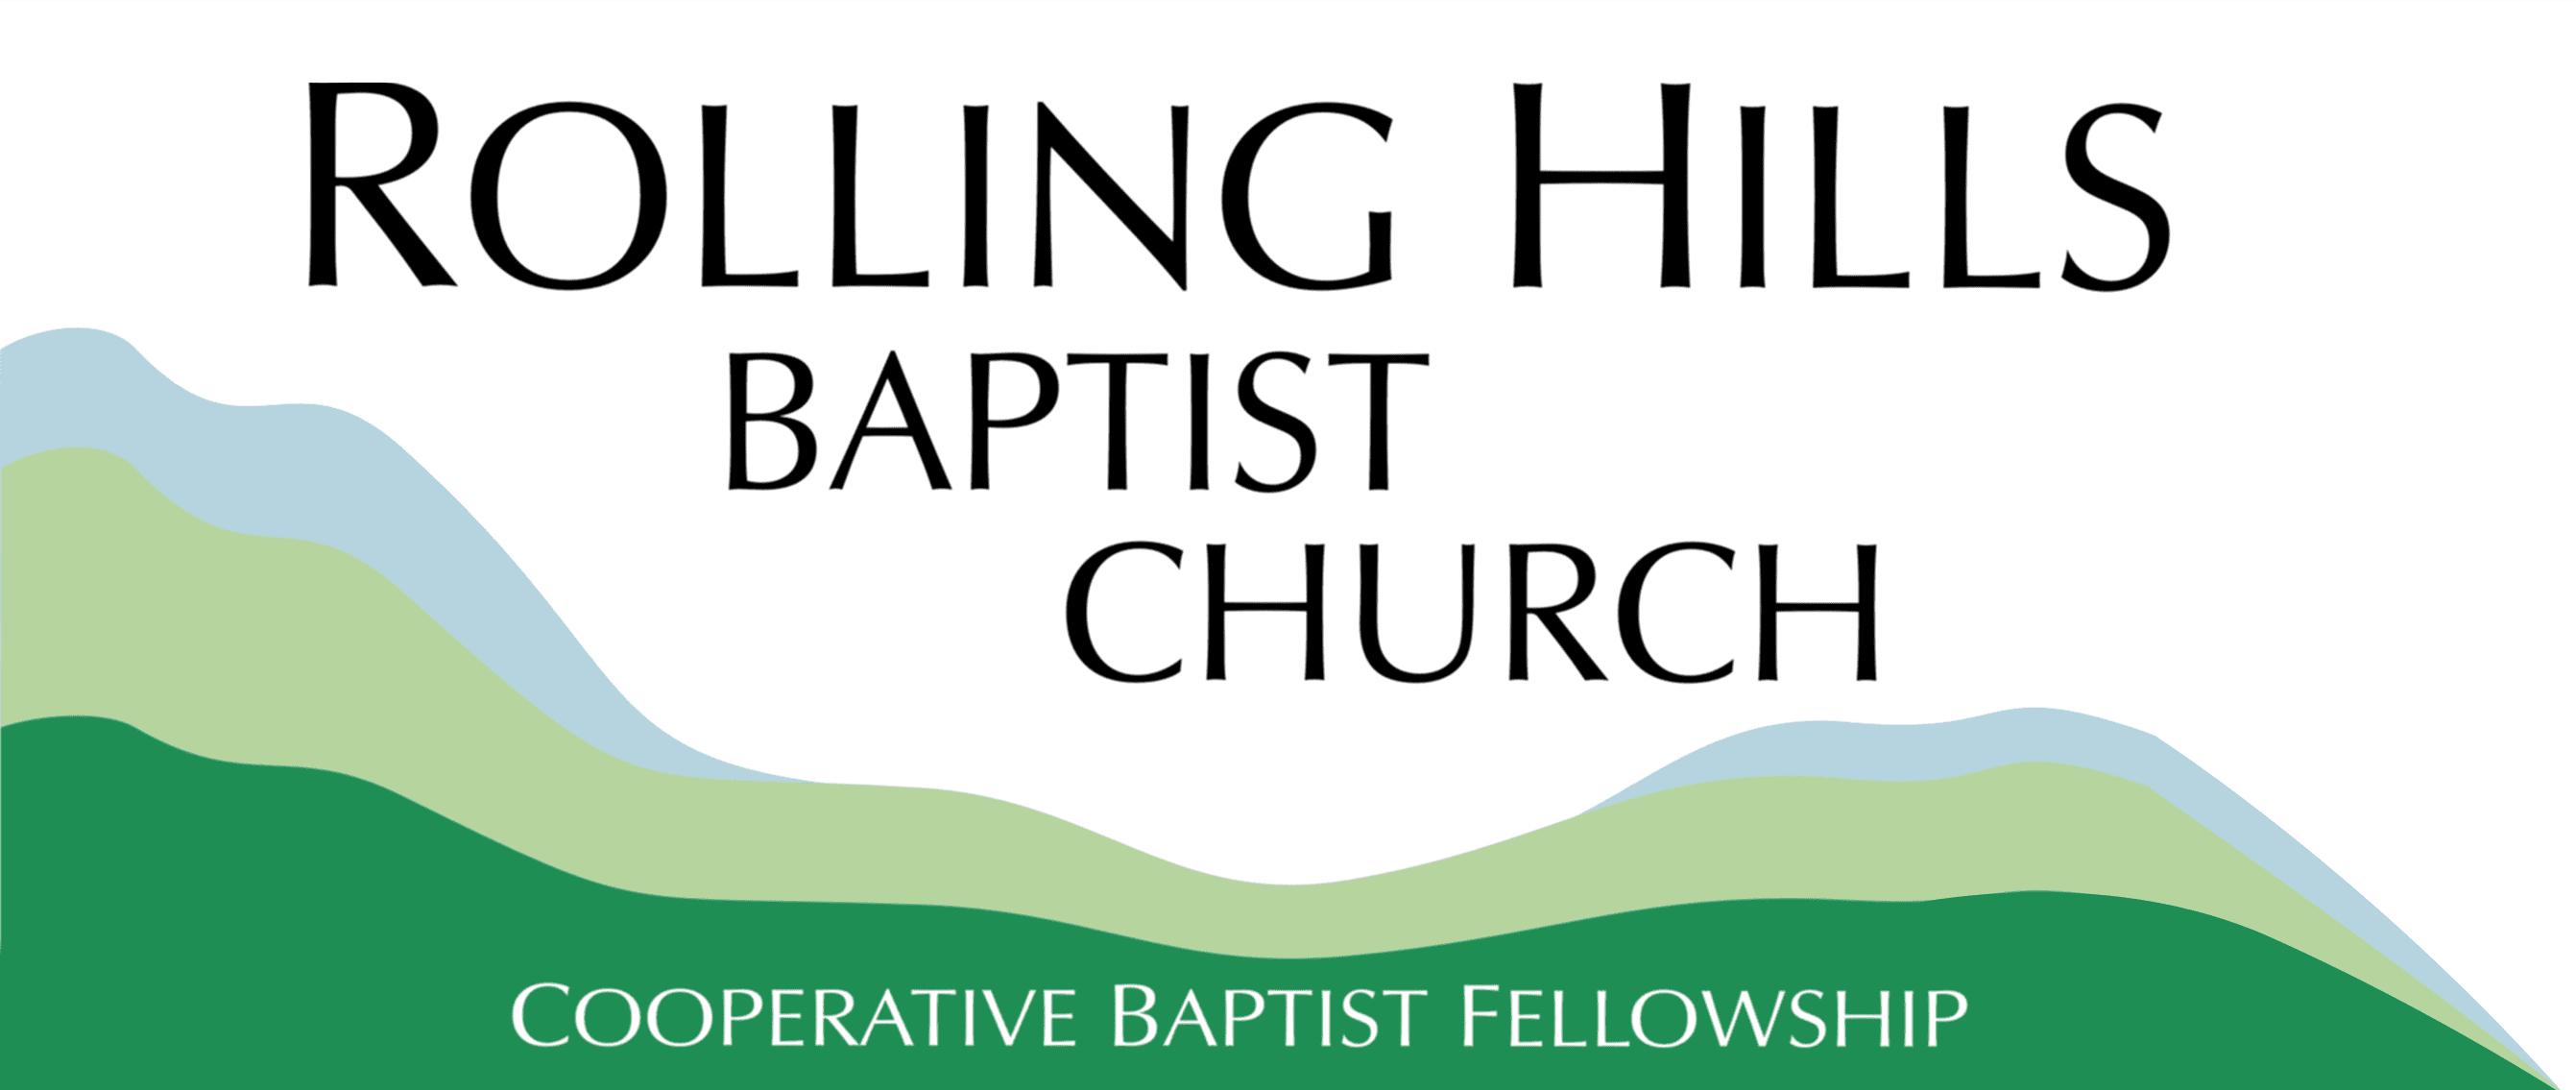 Rolling Hills Baptist Church